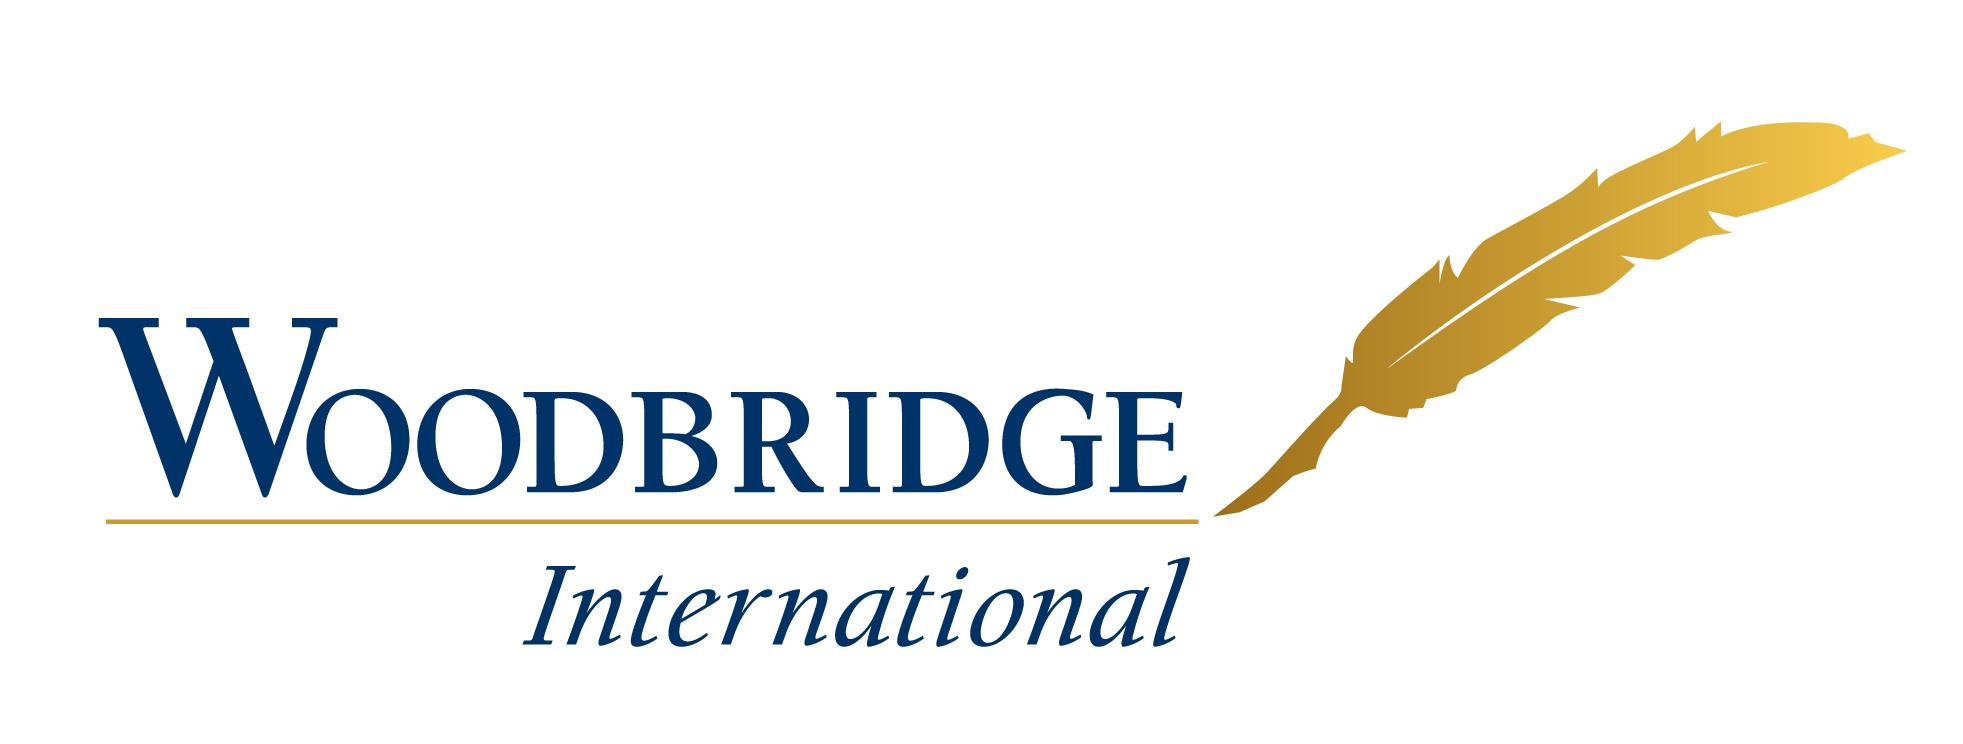 Woodbridge International logo